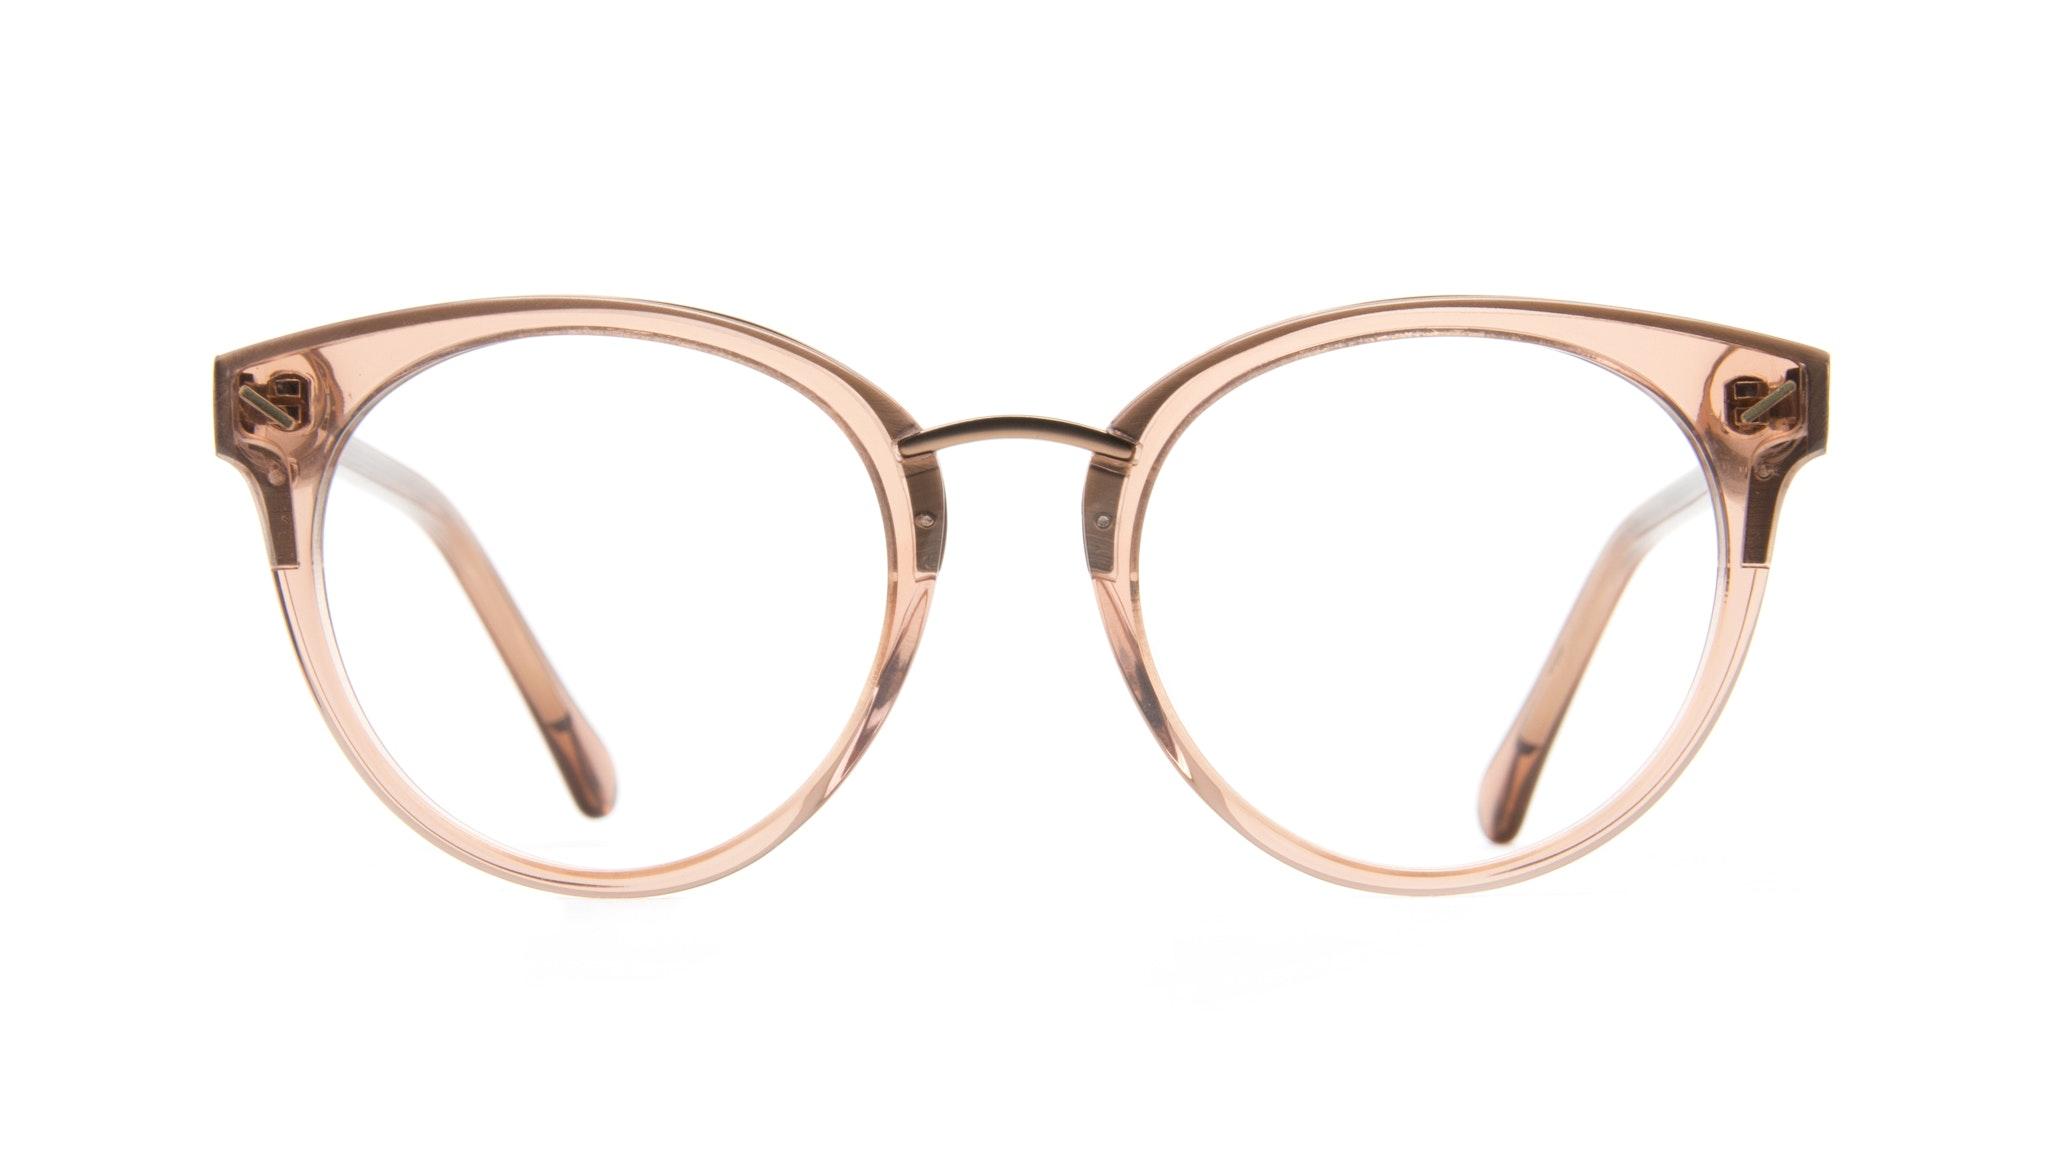 Affordable Fashion Glasses Cat Eye Round Eyeglasses Women Element Rose Front